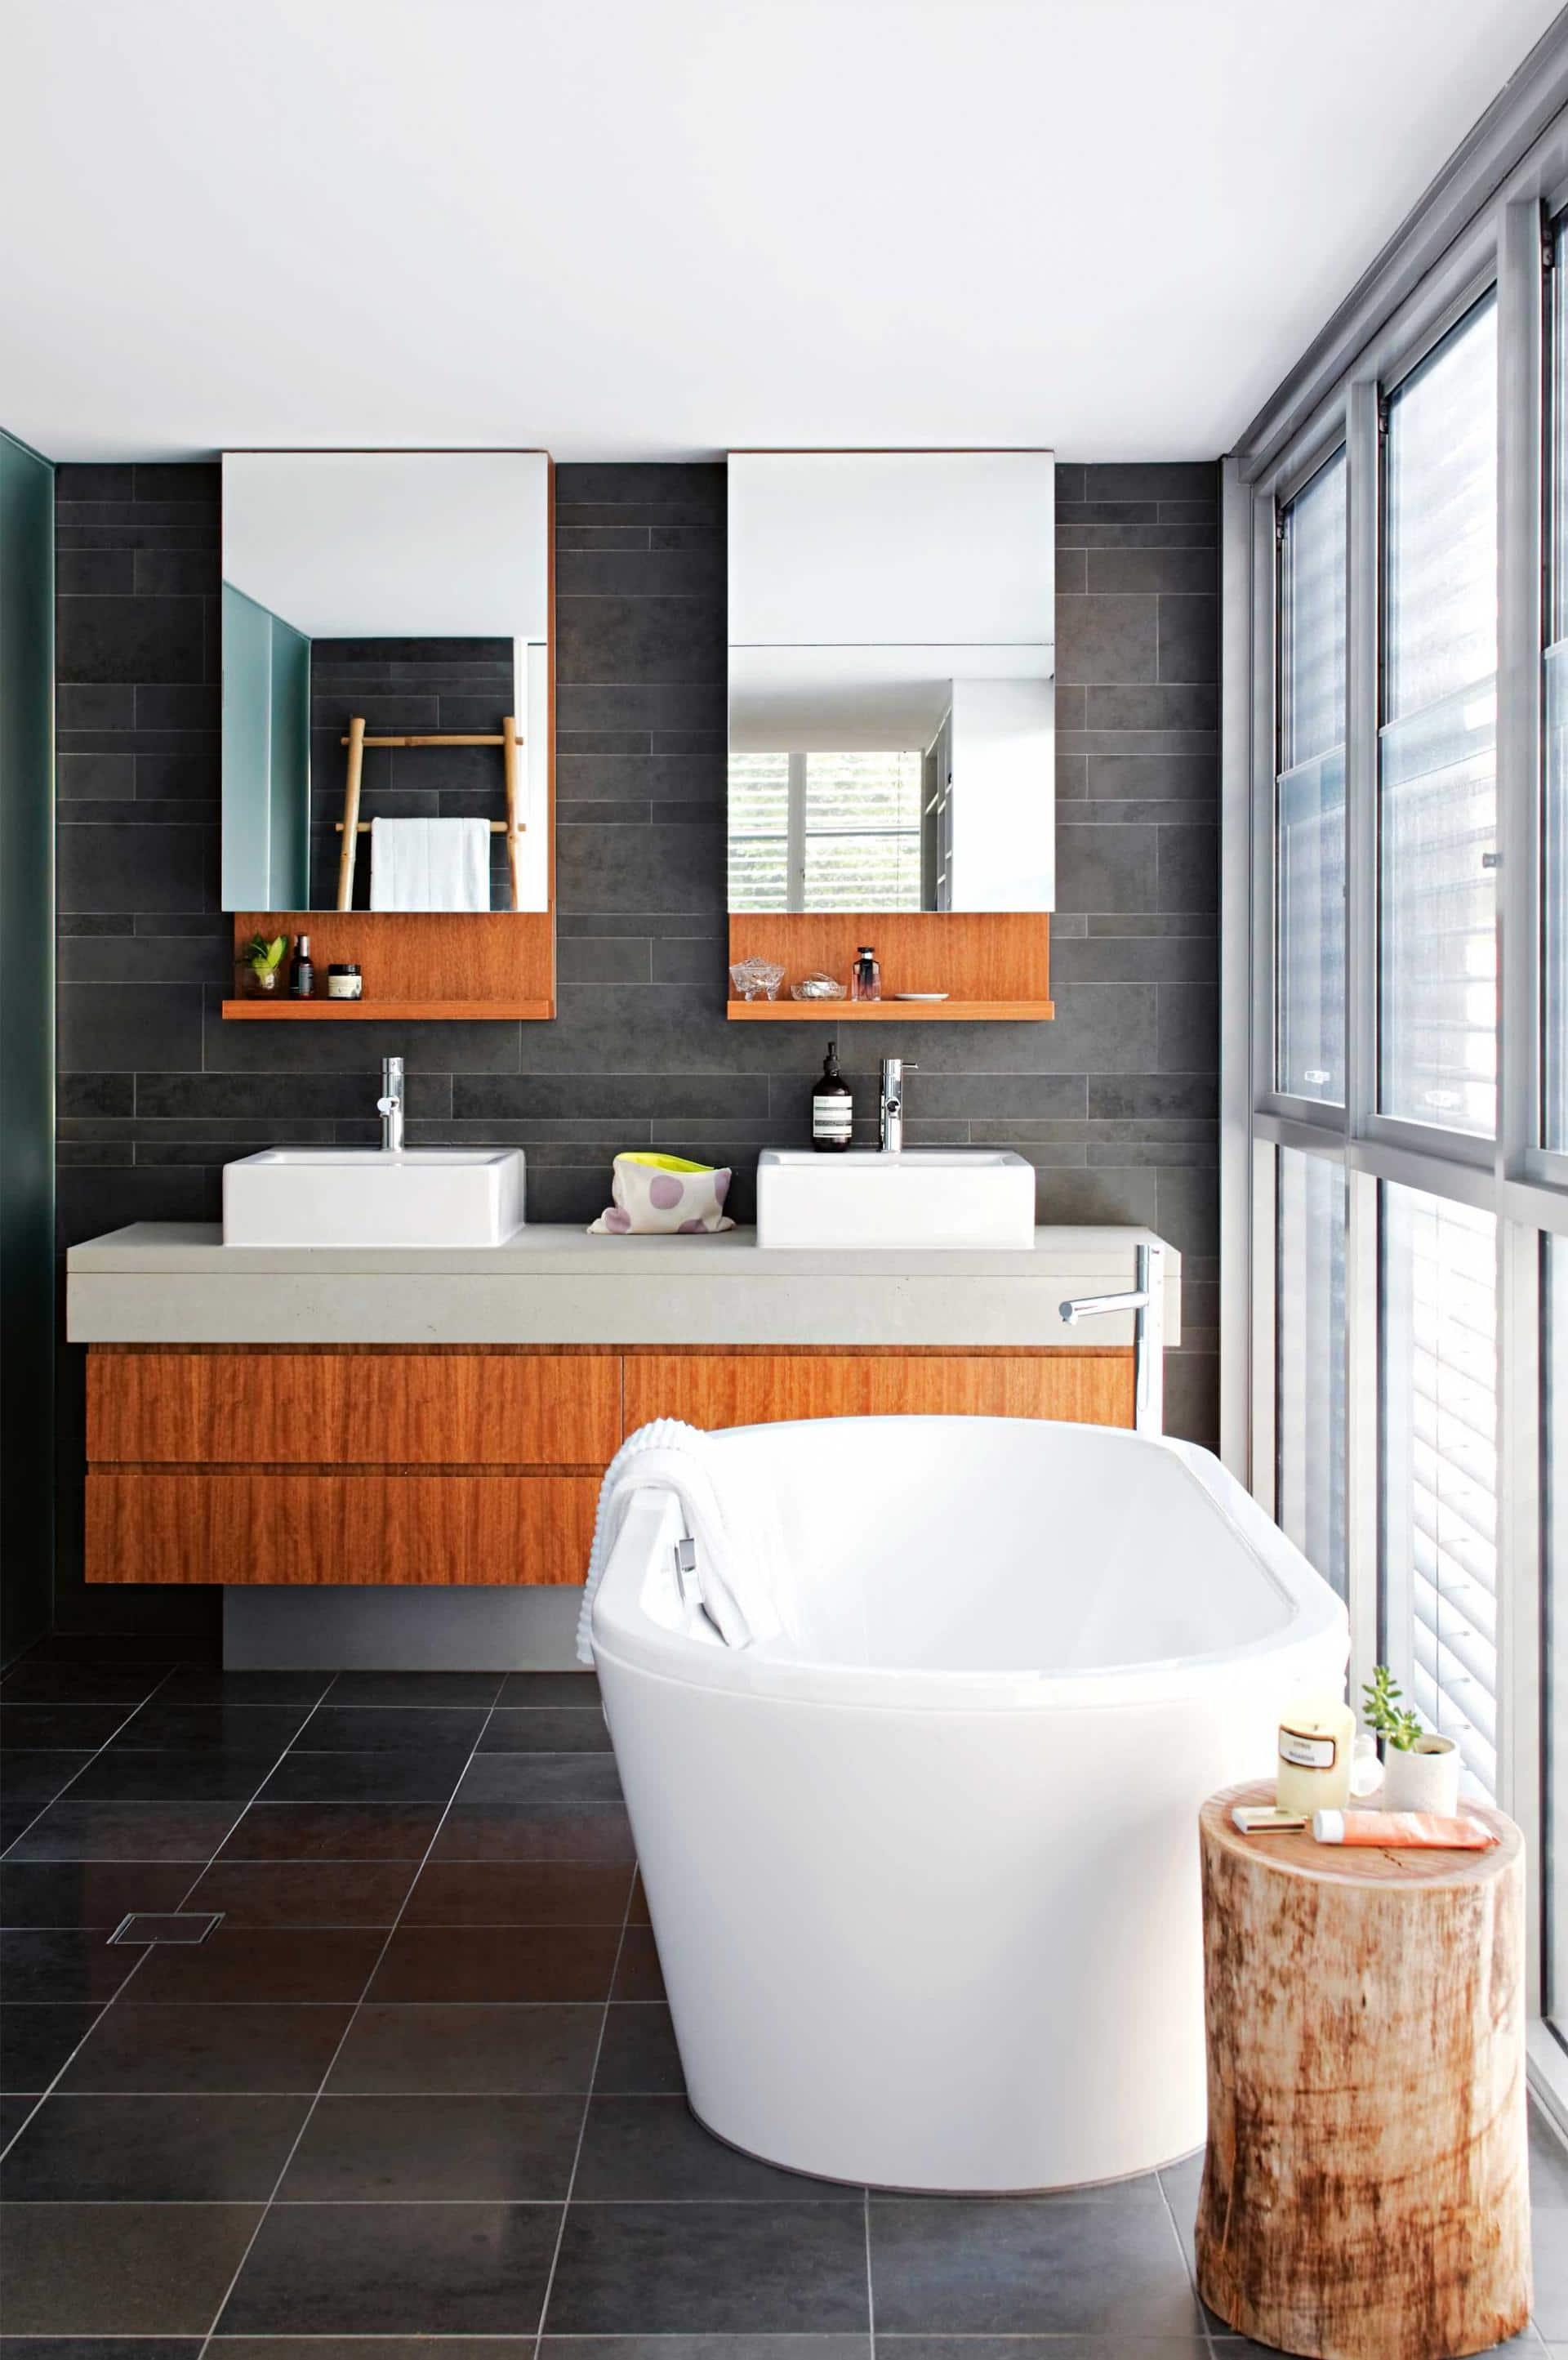 30 Fotos de Cuartos de Baño Modernos Que Te Sorprenderán - Estreno Casa